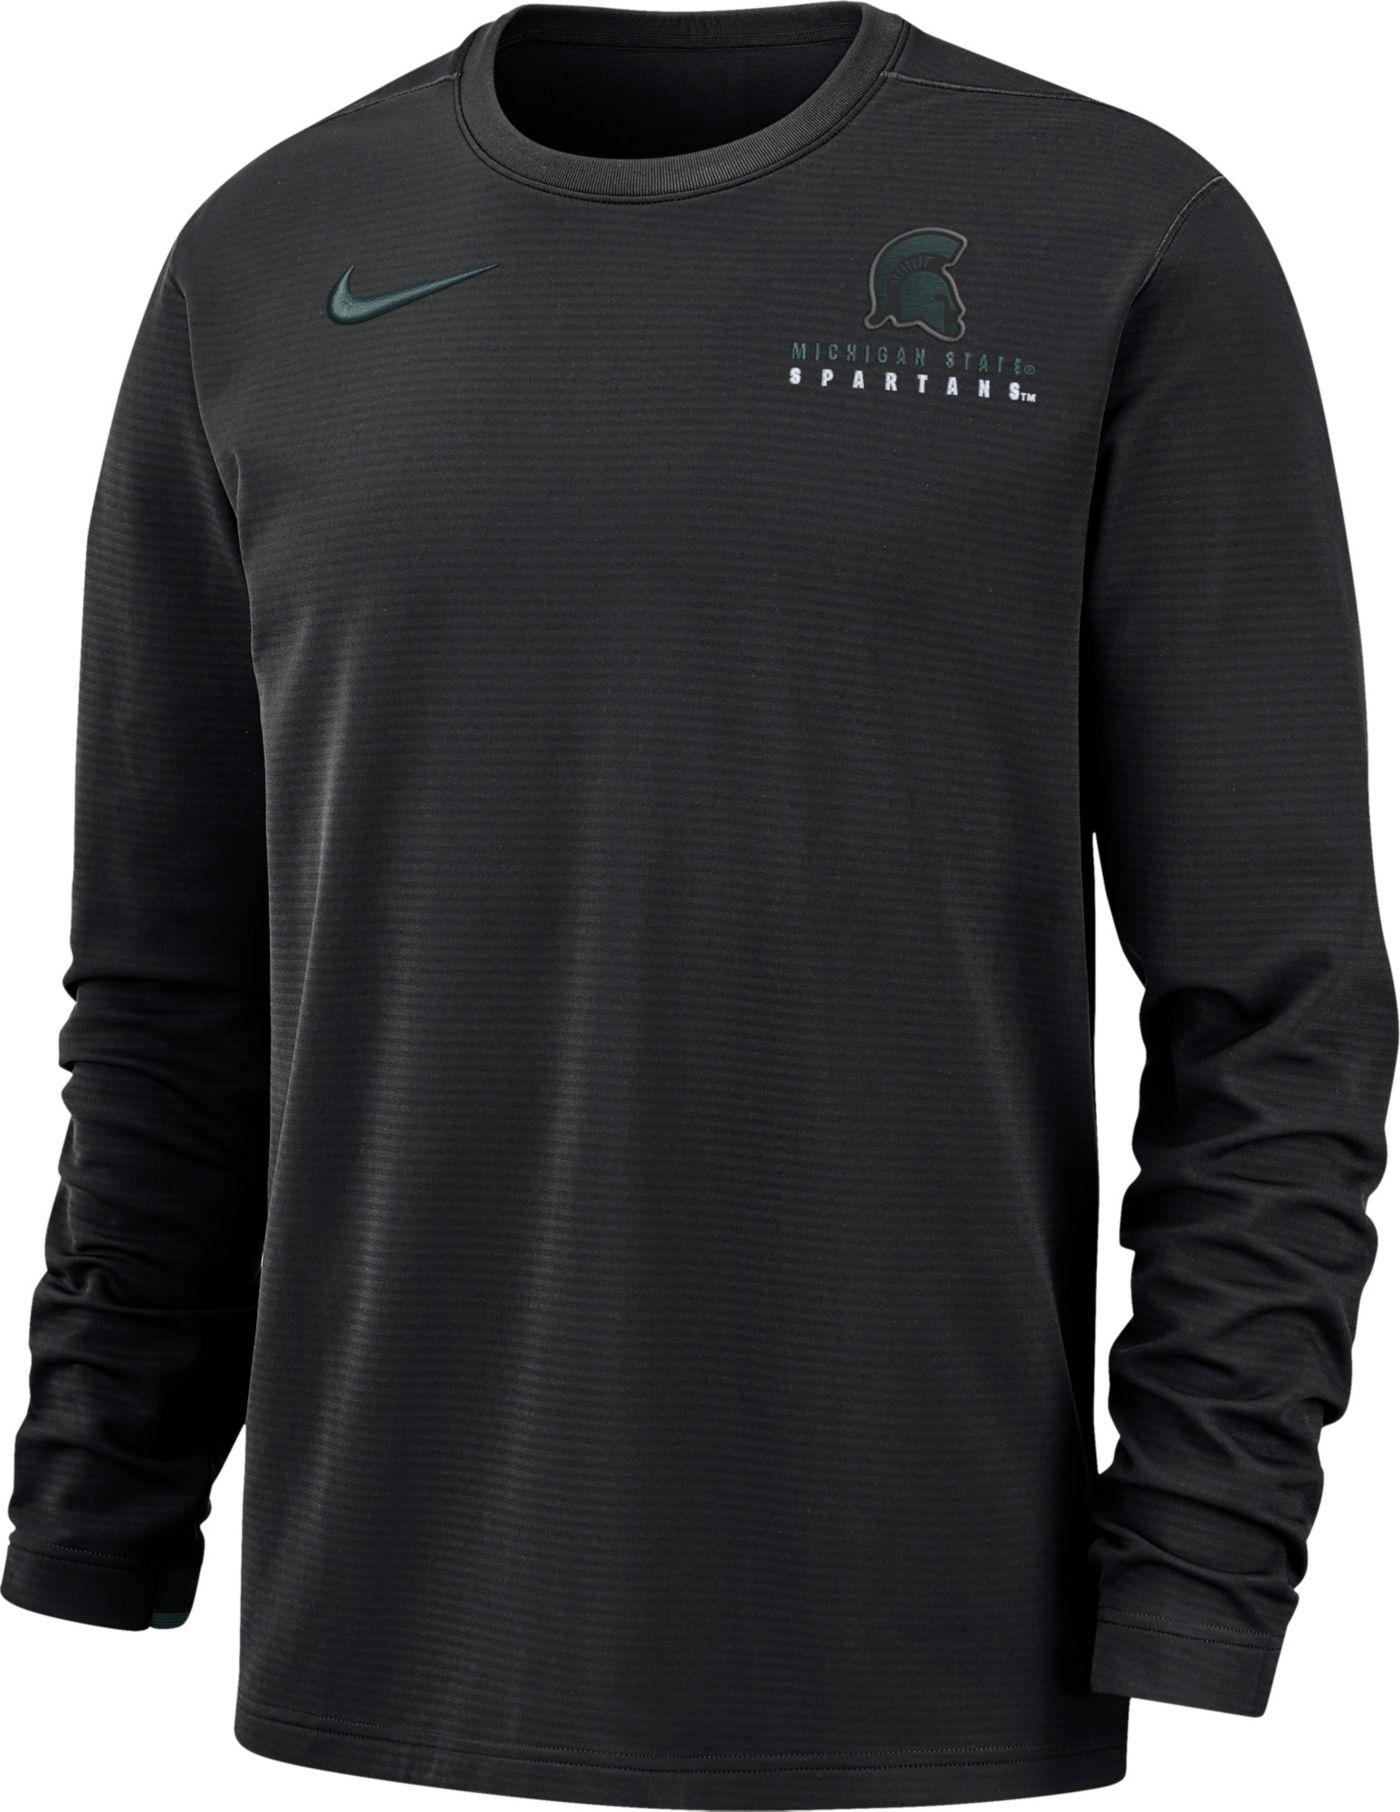 Nike Men's Michigan State Spartans Dri-FIT Modern Long Sleeve Crew Neck Black T-Shirt